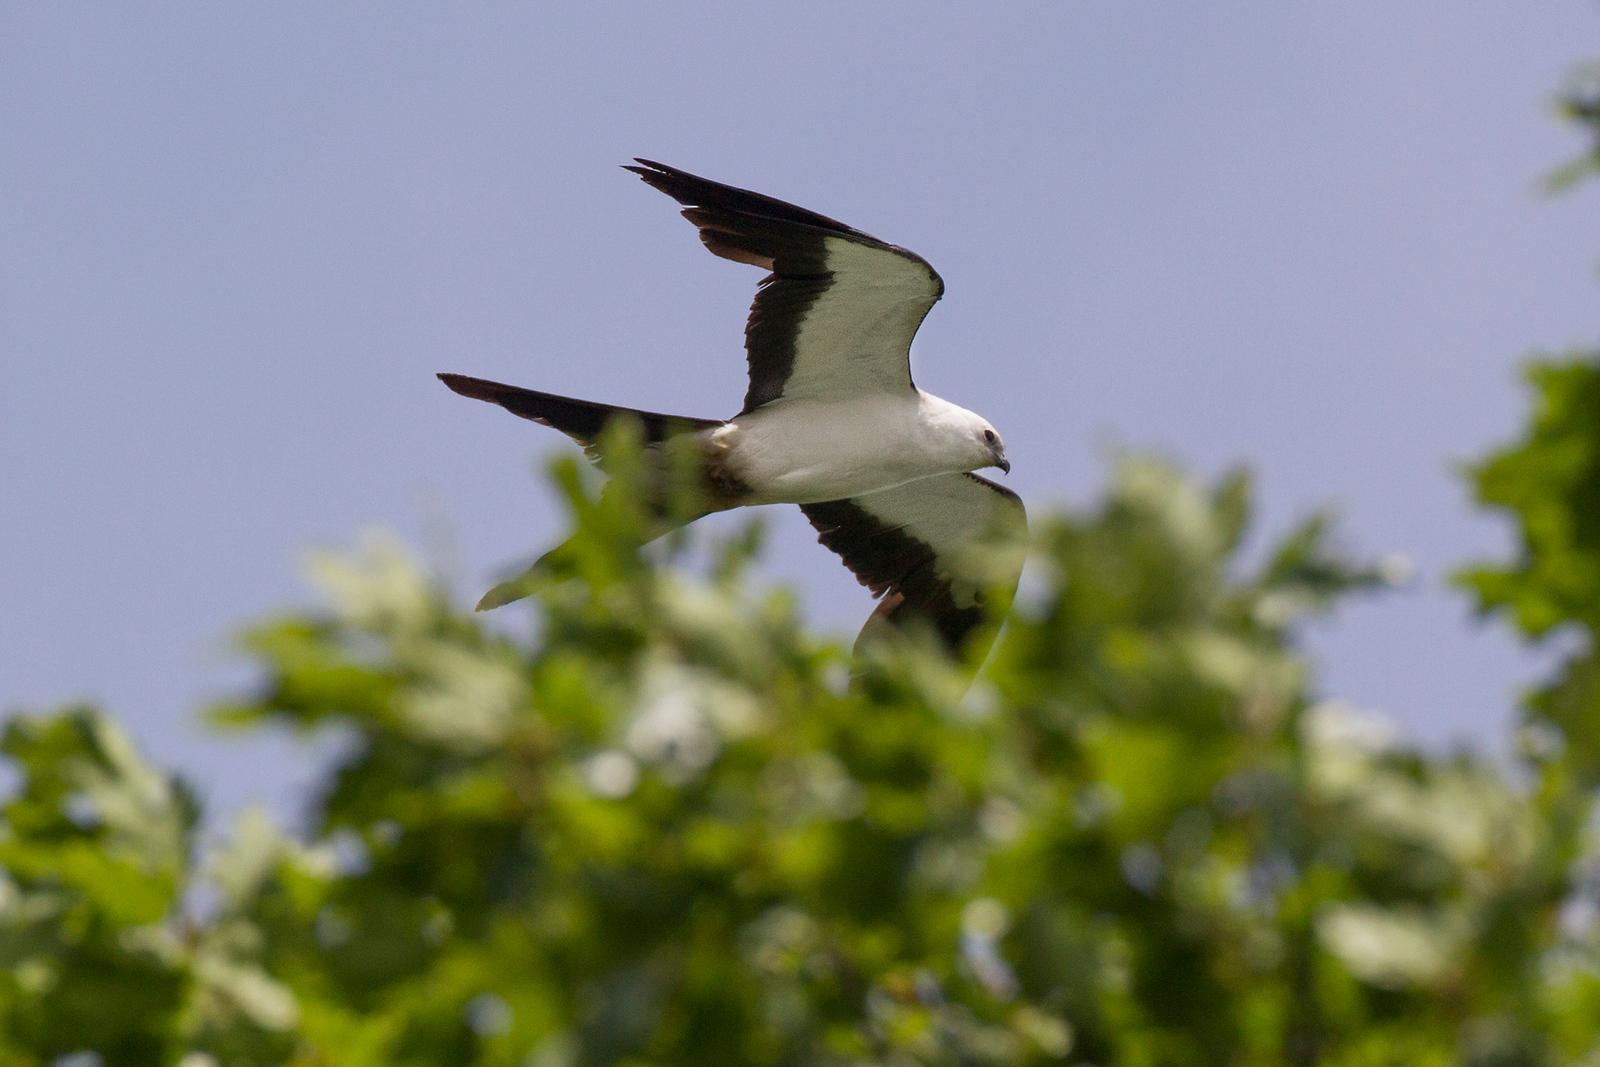 Swallow-tailed Kite, Tippecanoe County, Indiana, June 4, 2013, #322.